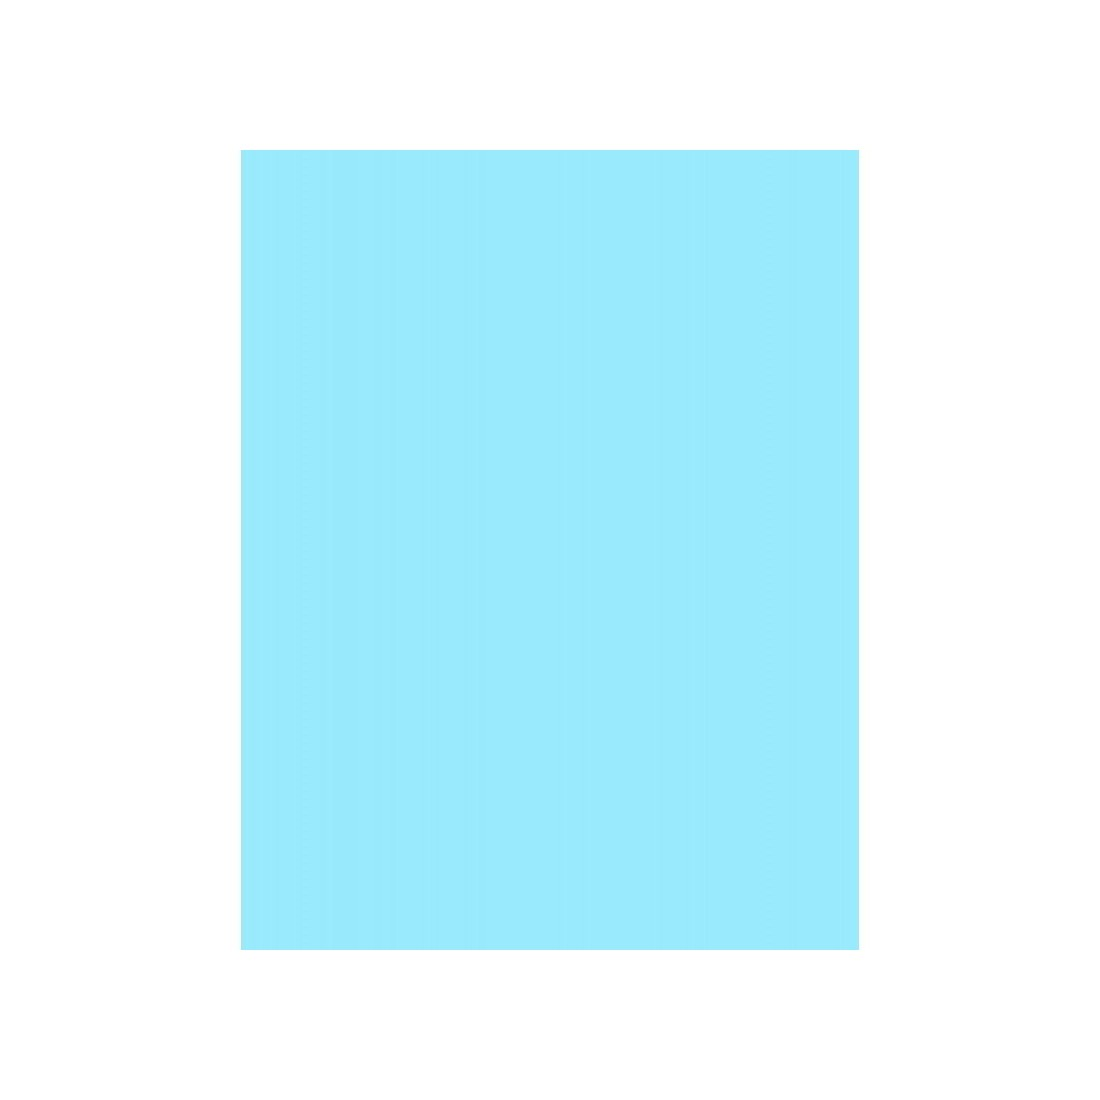 50 Hojas De Color Azul Tamaño Carta Madi E Commerce